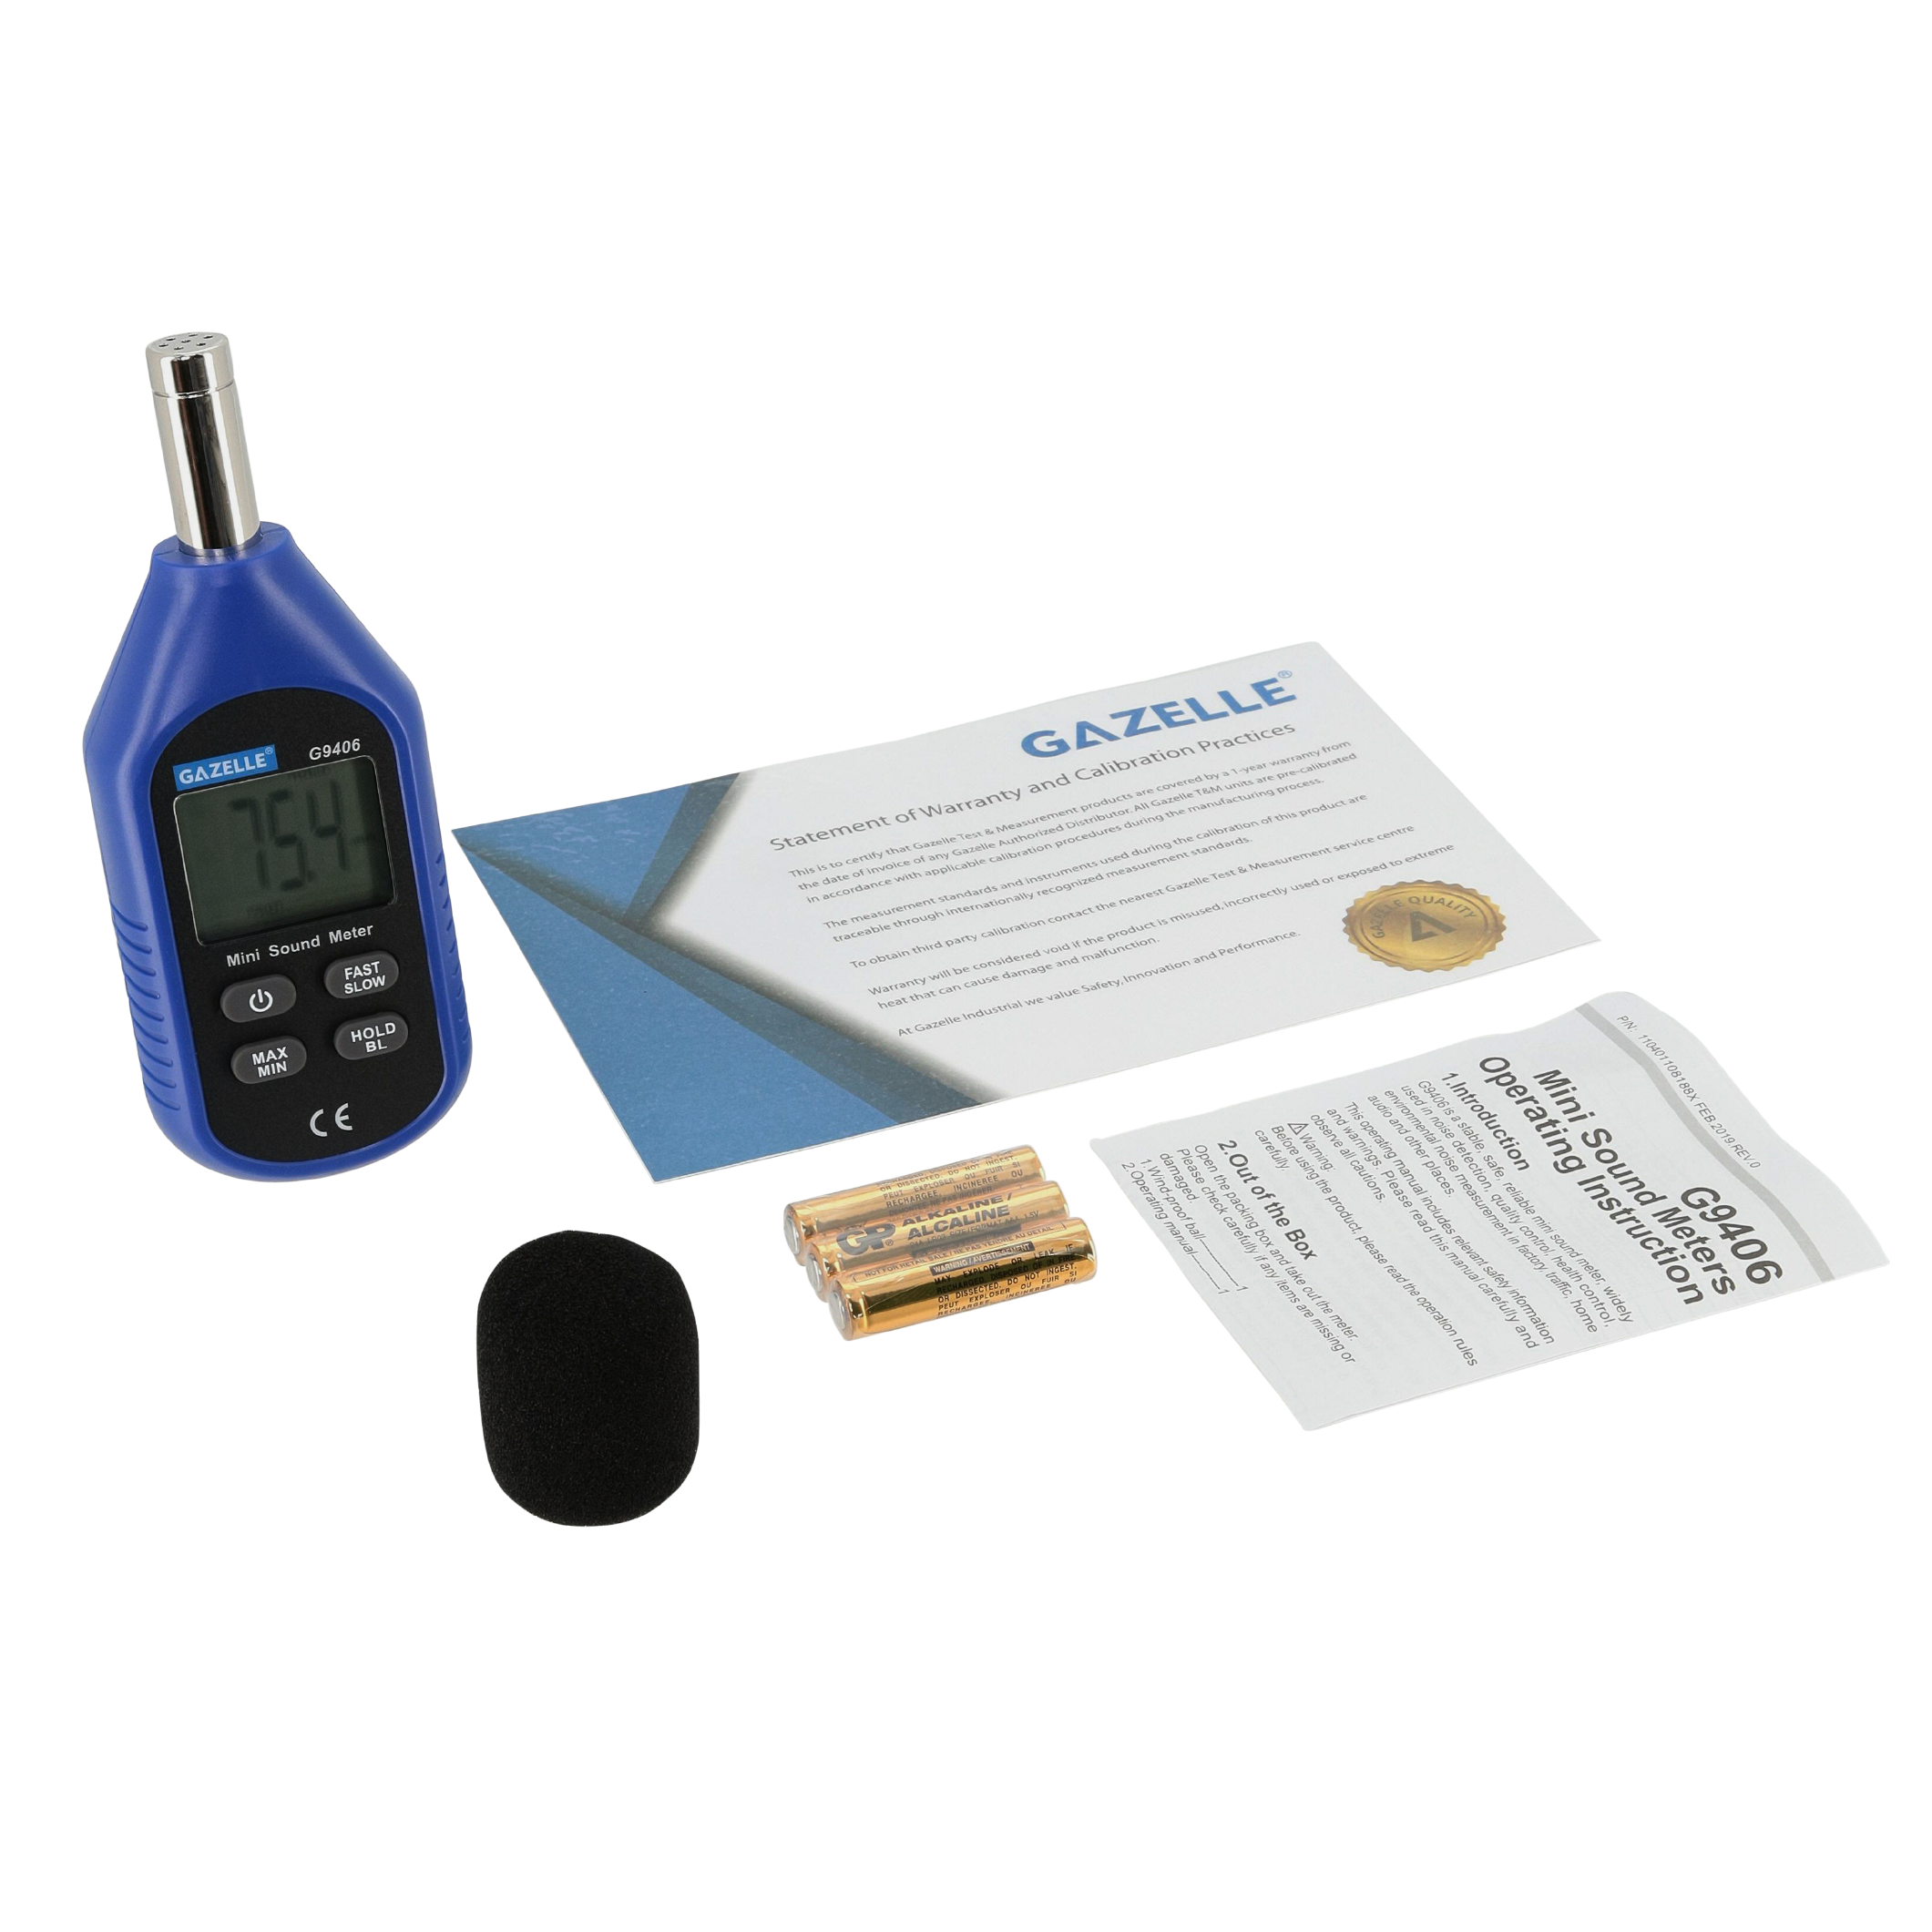 GAZELLE G9406 - Mini Sound Level Meter